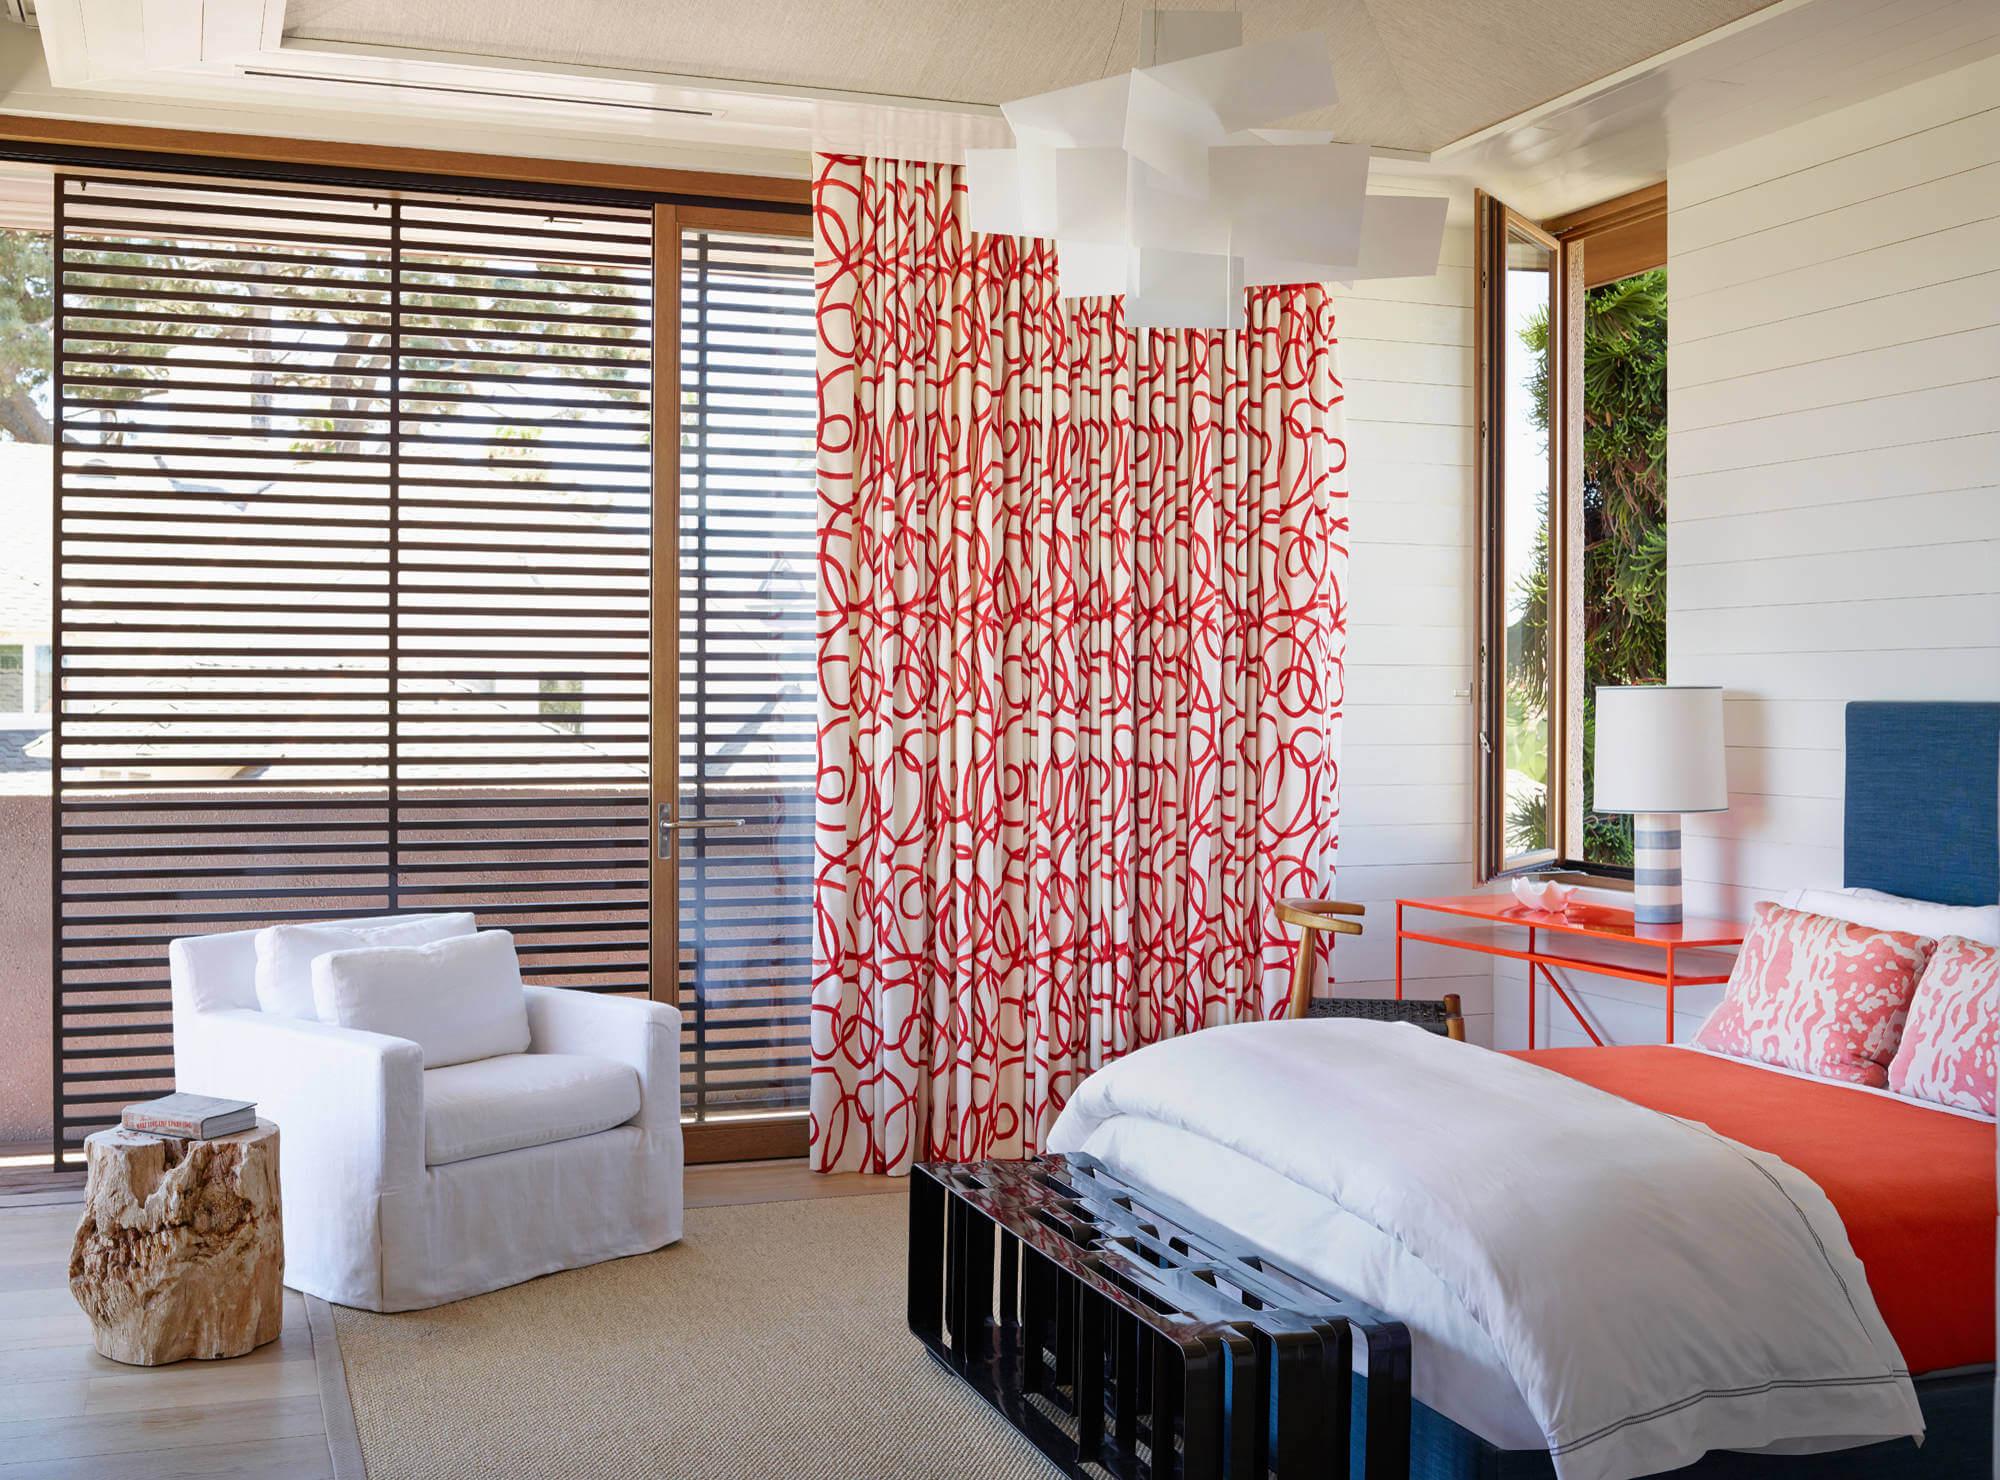 Mediterranean Coronado Residence near San Diego by Island Architects-08